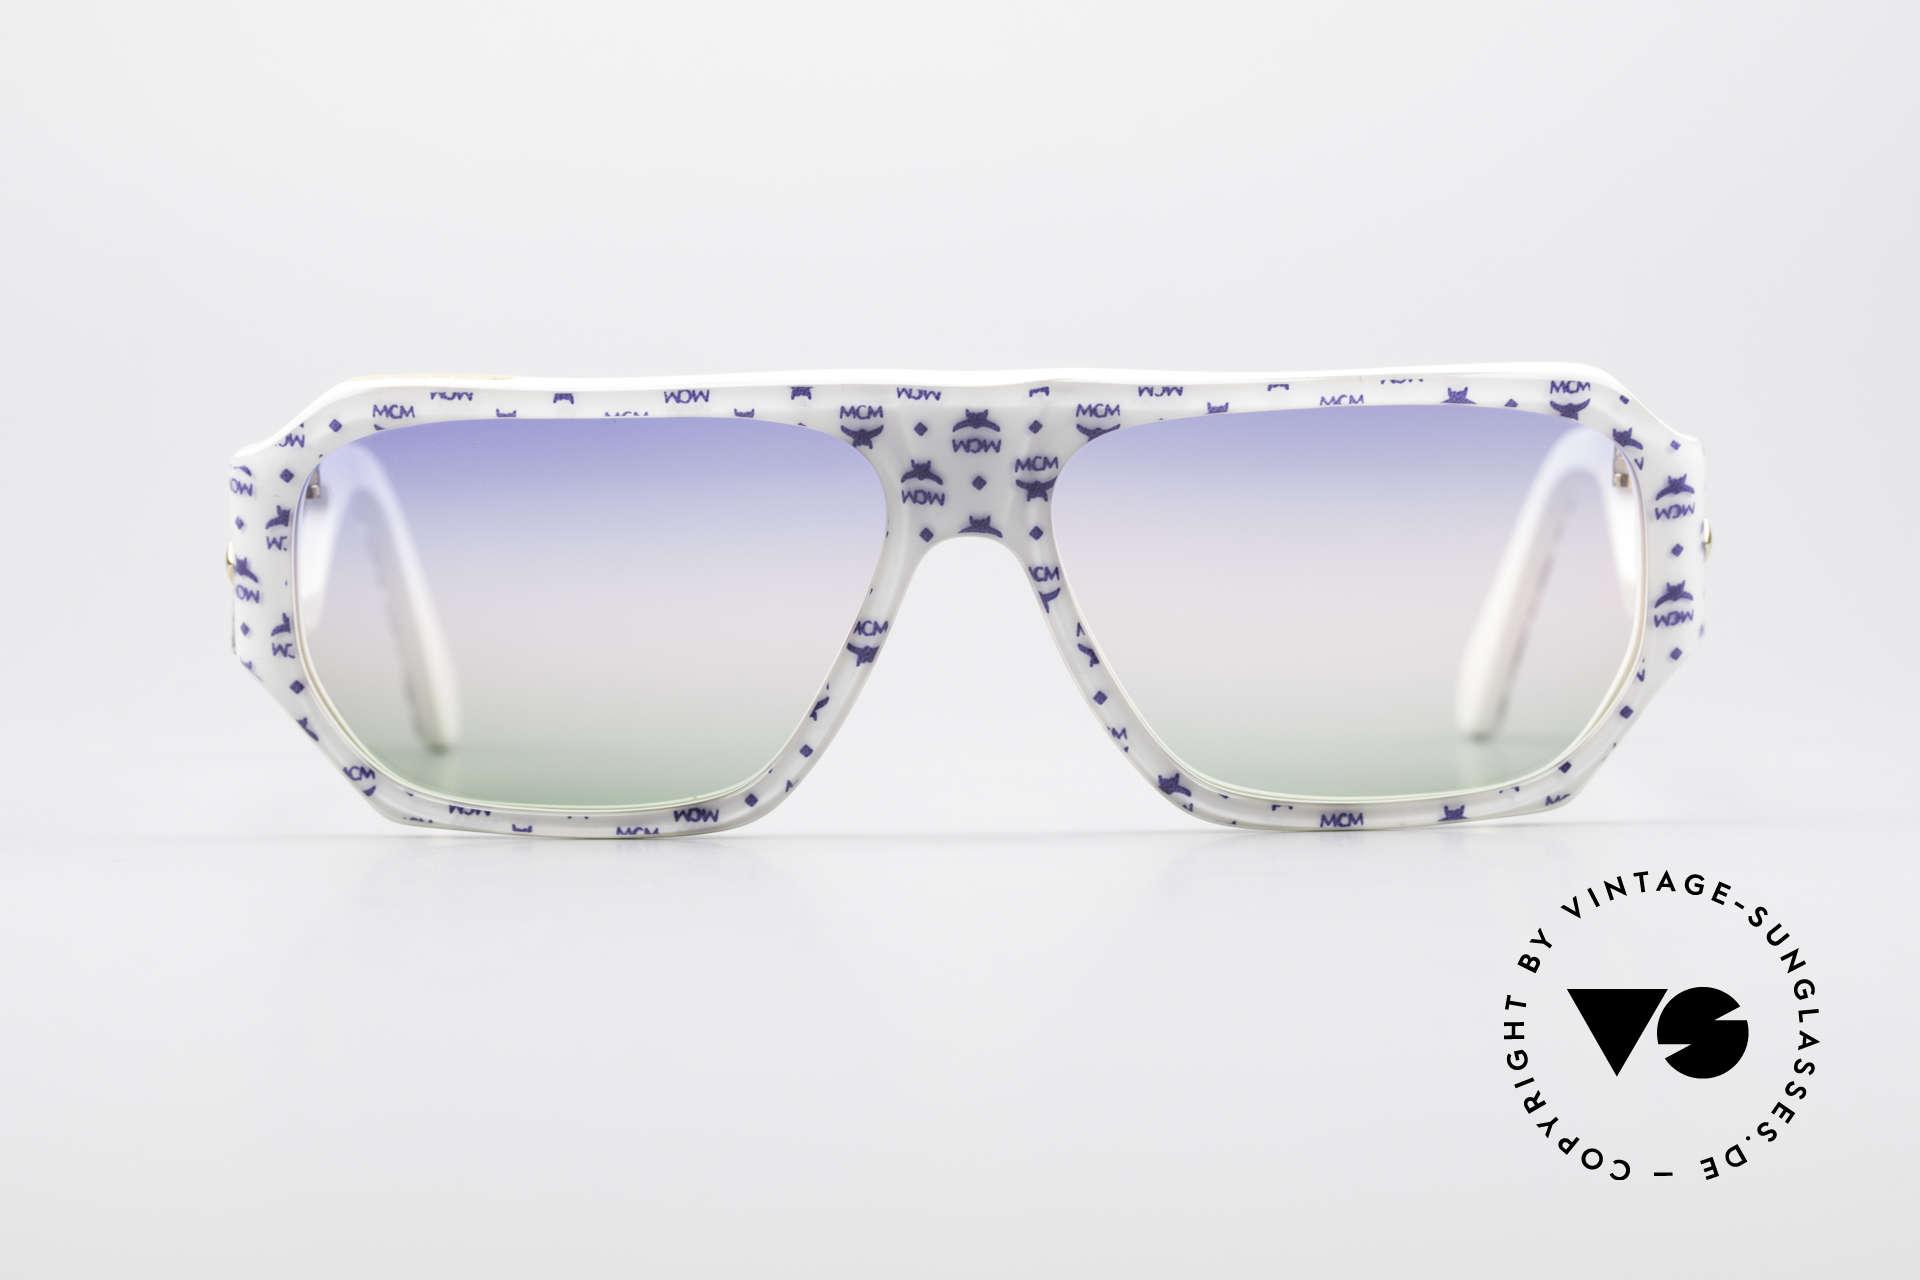 MCM München A2 Rare 80's Designer Sunglasses, rare MCM sunglasses by Michael Cromer (M.C.), Made for Men and Women